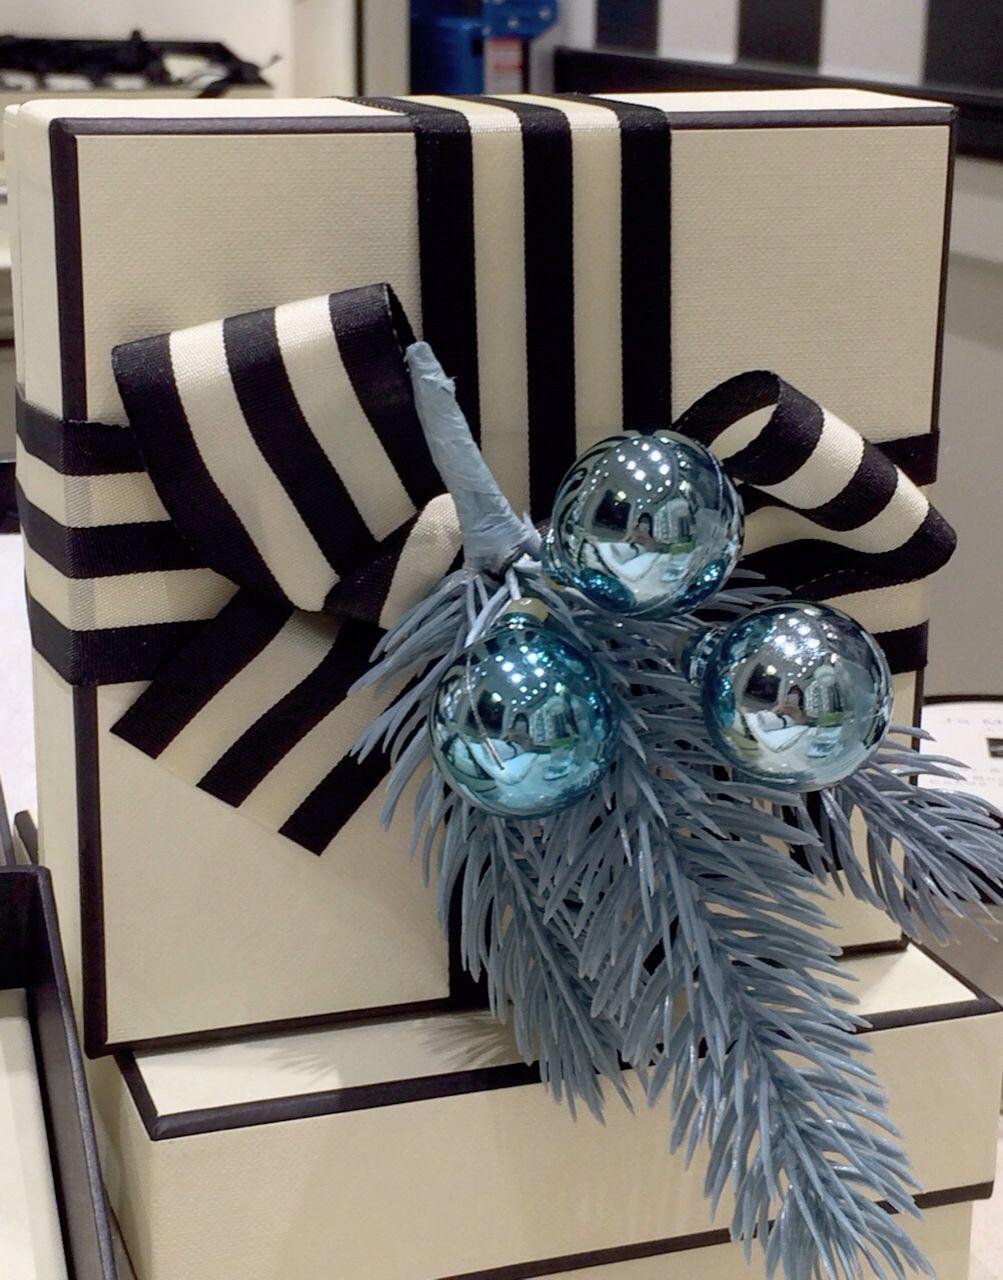 Pretty Jo Malone box comes with blue mistletoe this Christmas